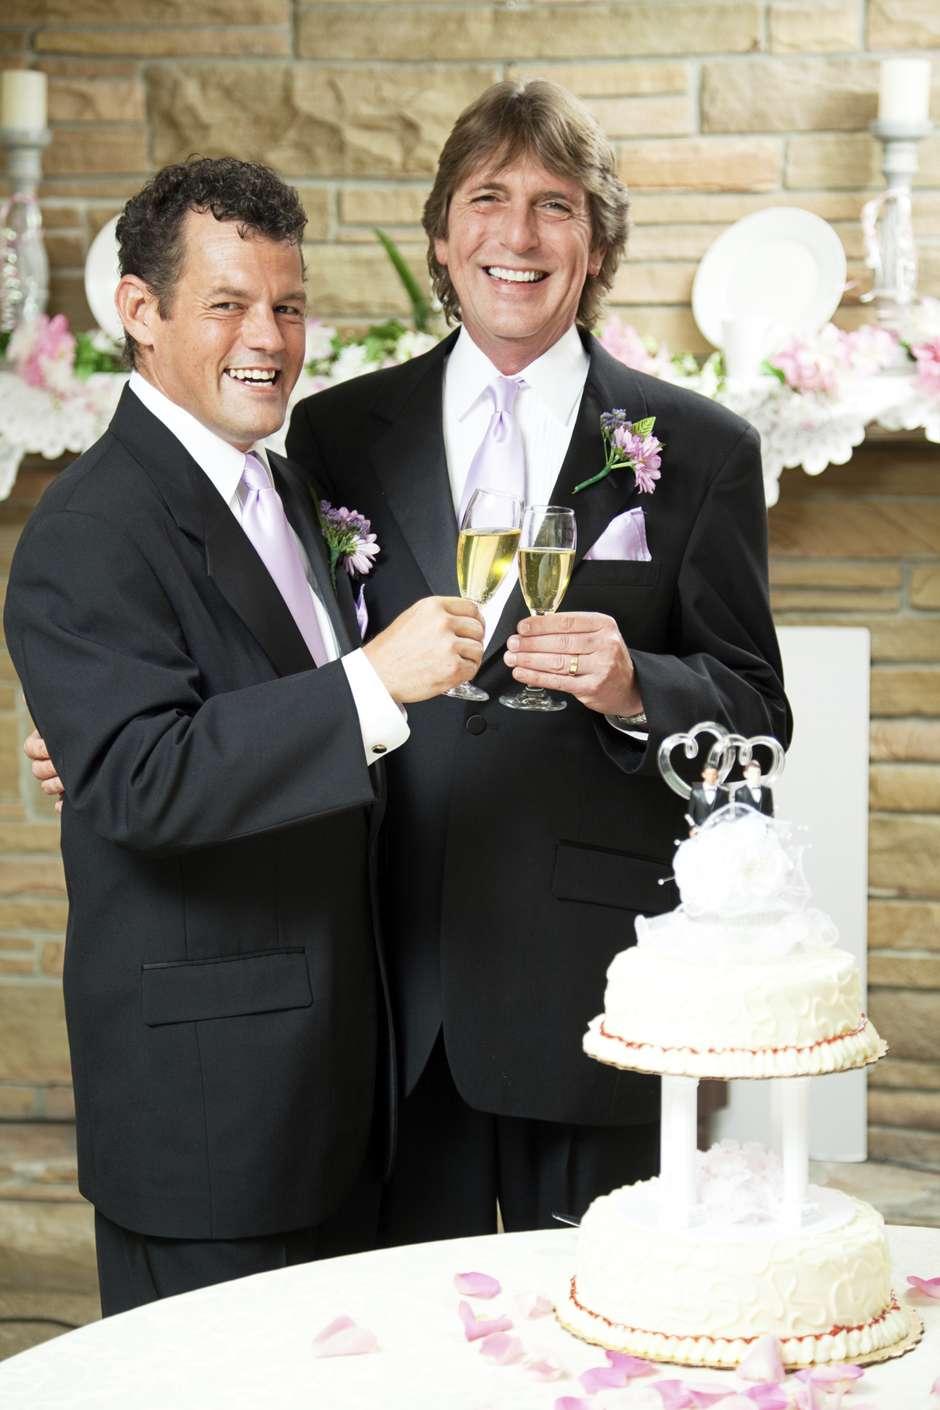 What excellent Casamento entre homossexuais can